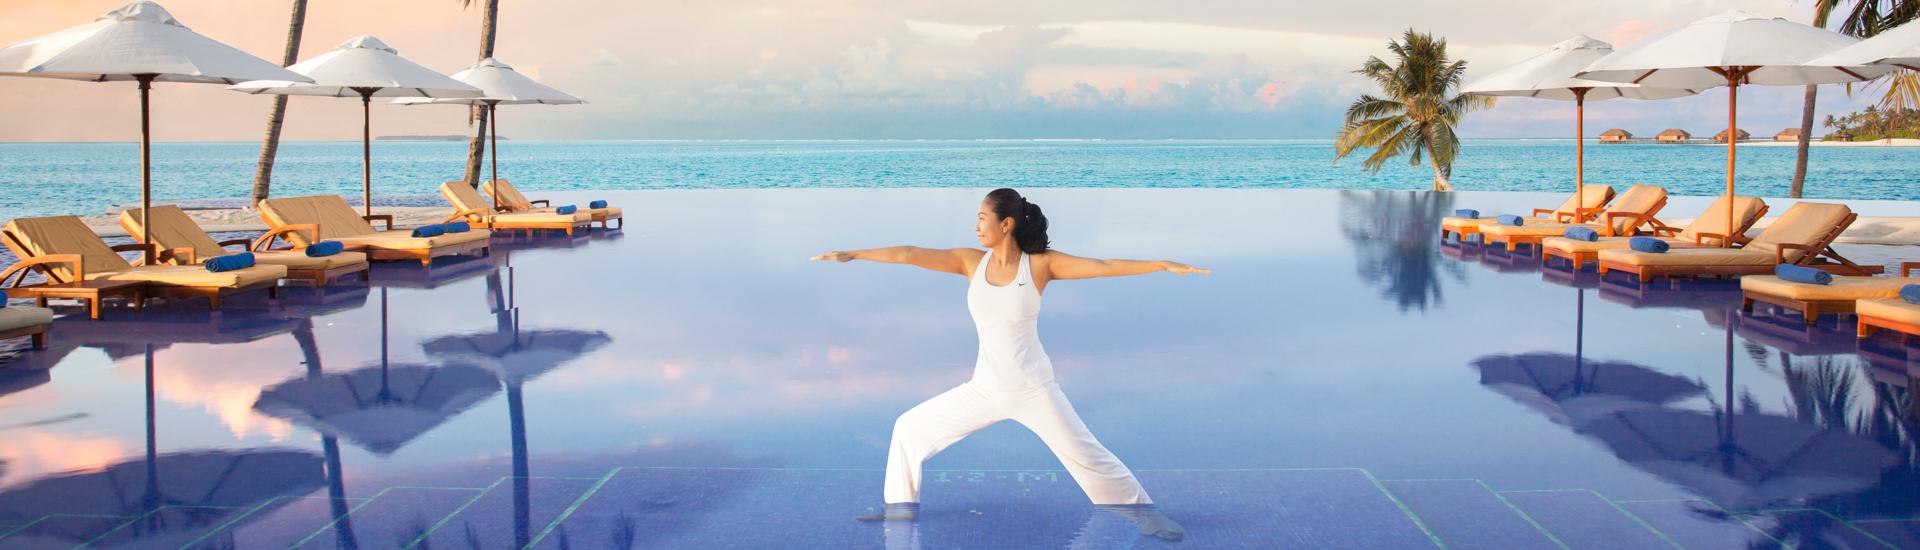 Conrad Maldives infinity view pool with yoga